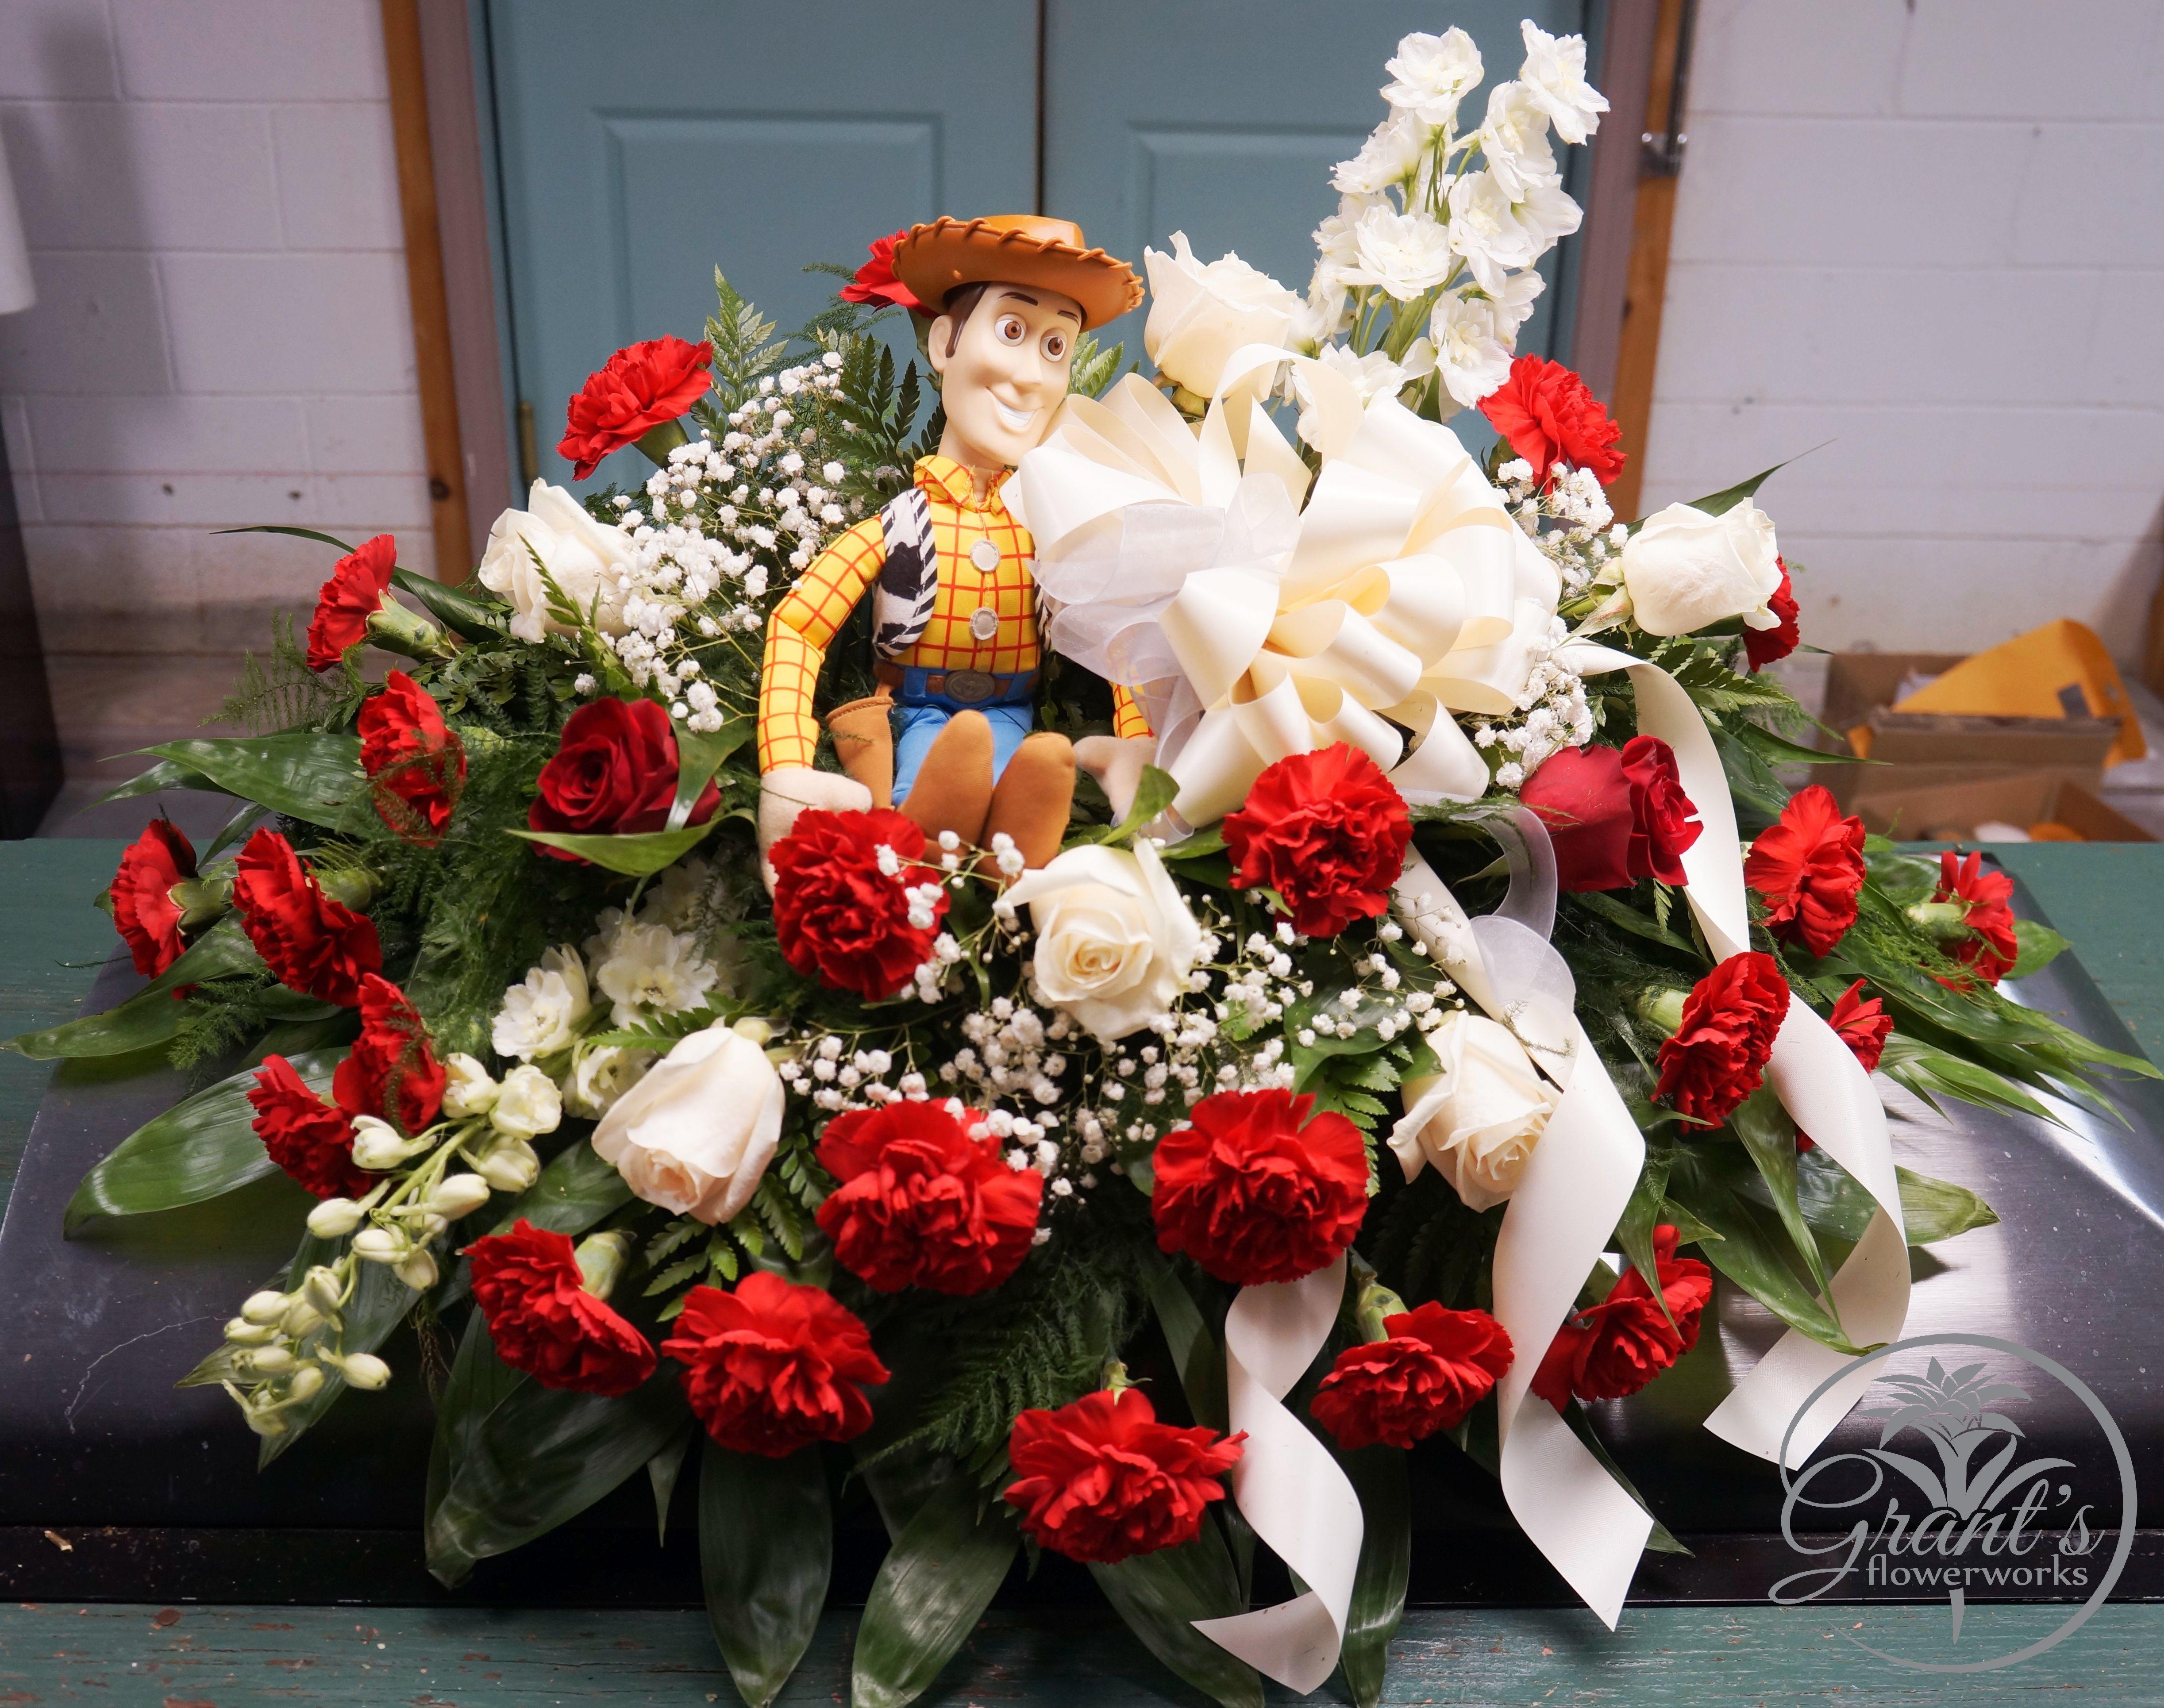 Childs casket spray by grants flowerworks casket